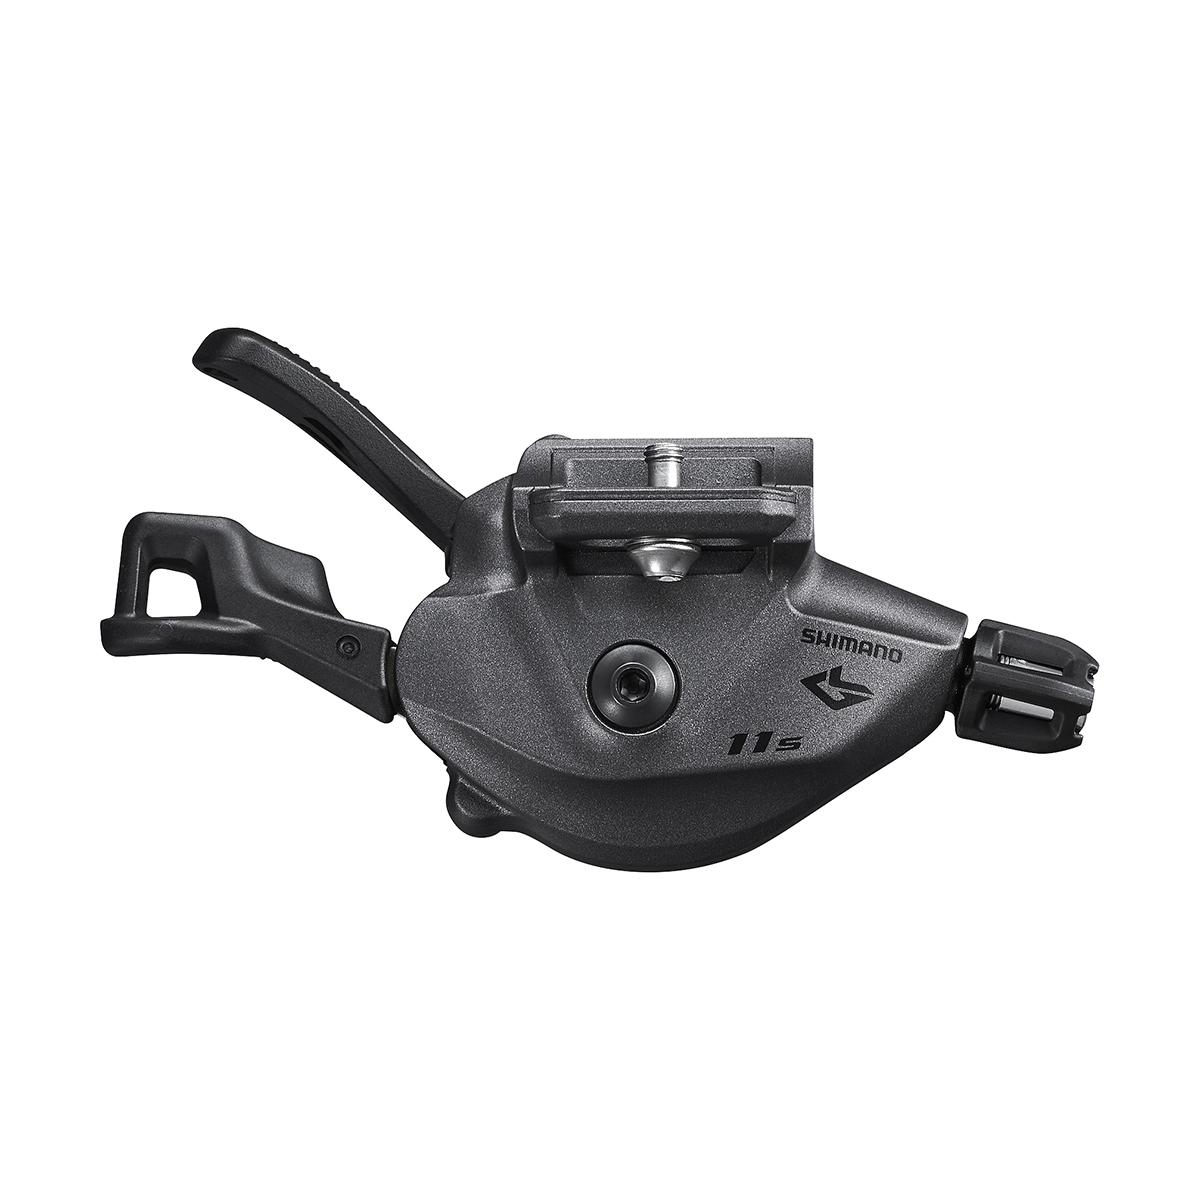 Shift lever Right 11s SL-M8130-IR Deore XT Linkglide I-SPEC EV